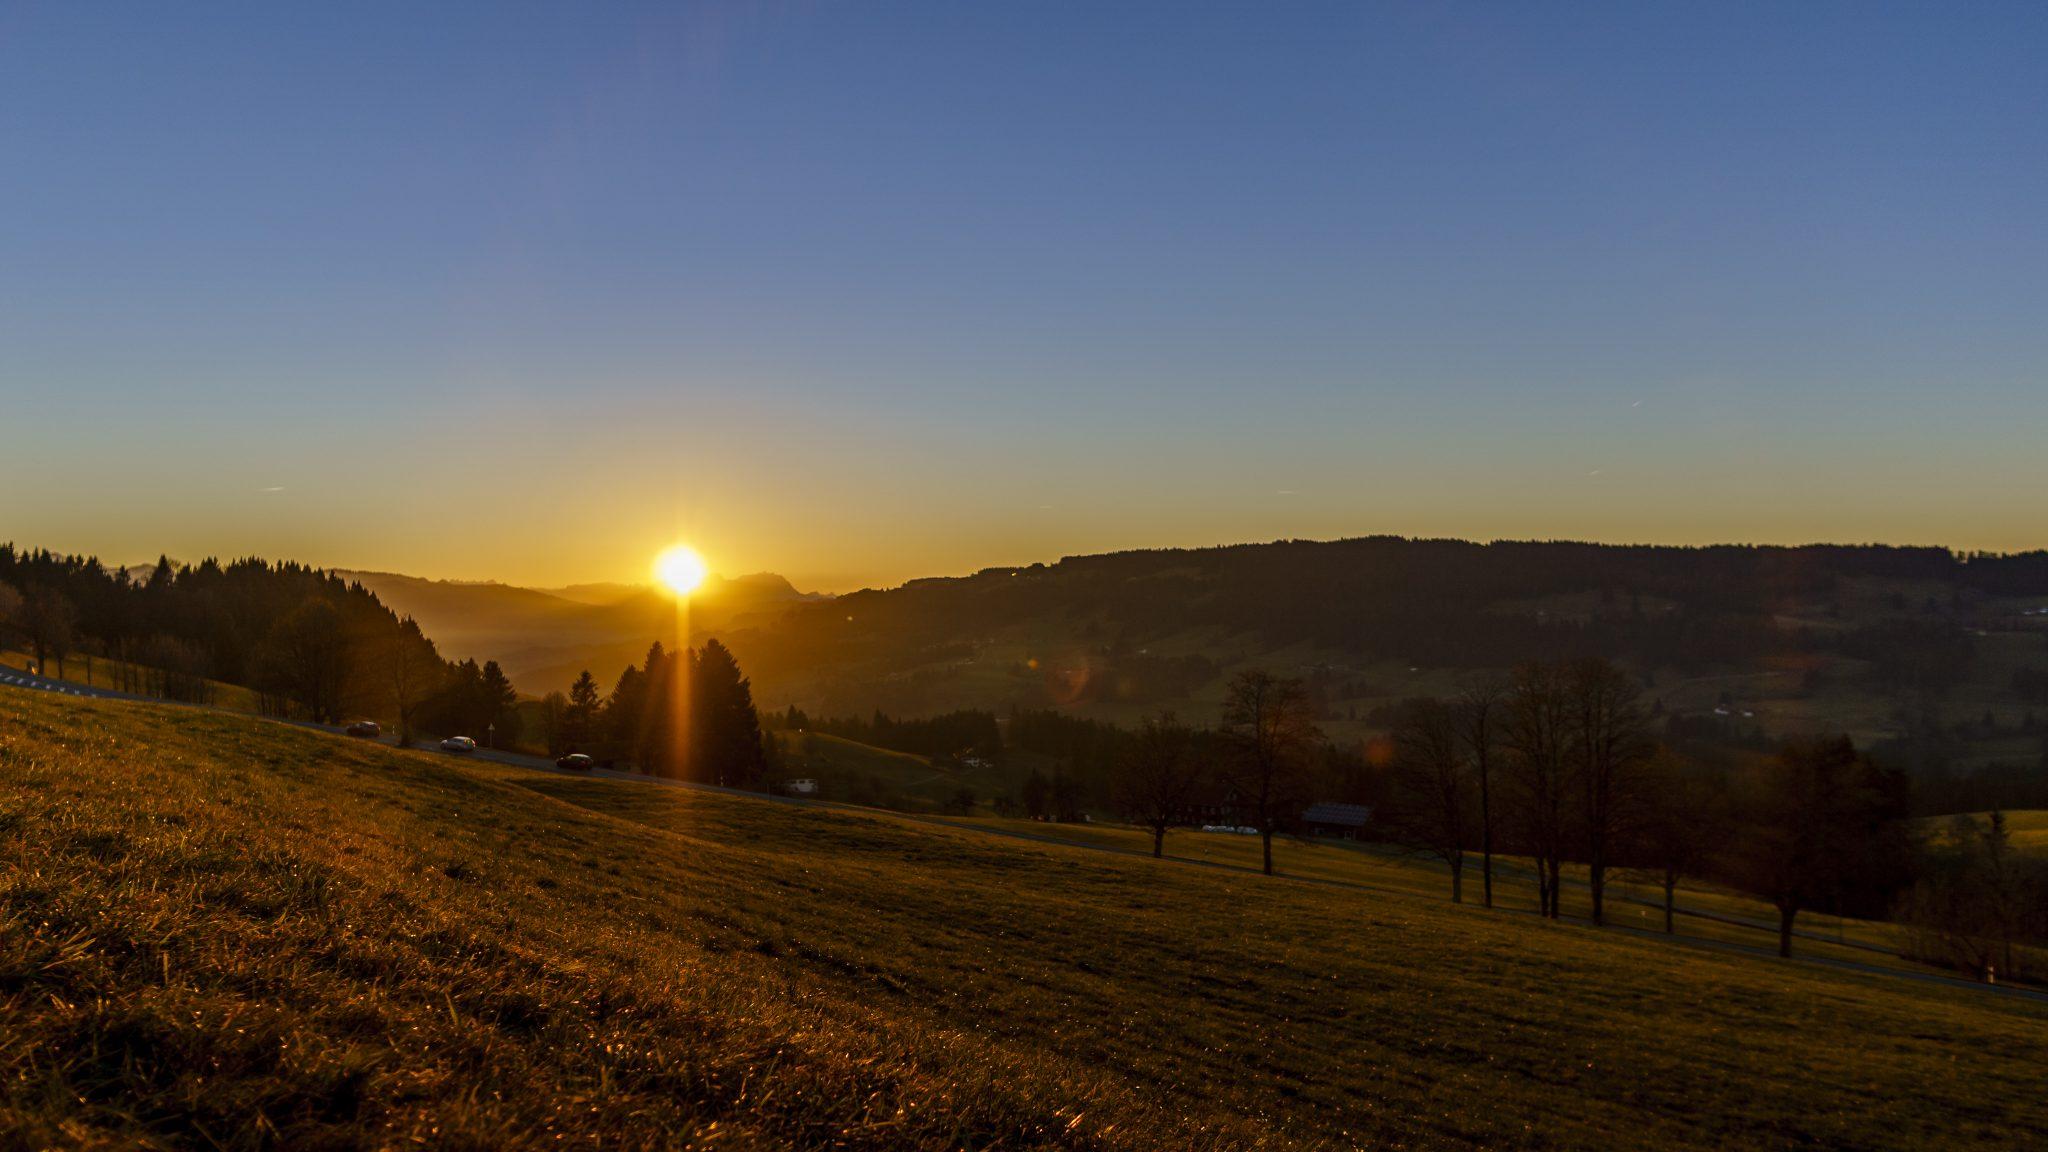 Oberstaufen – Timelapse Sonnenuntergang